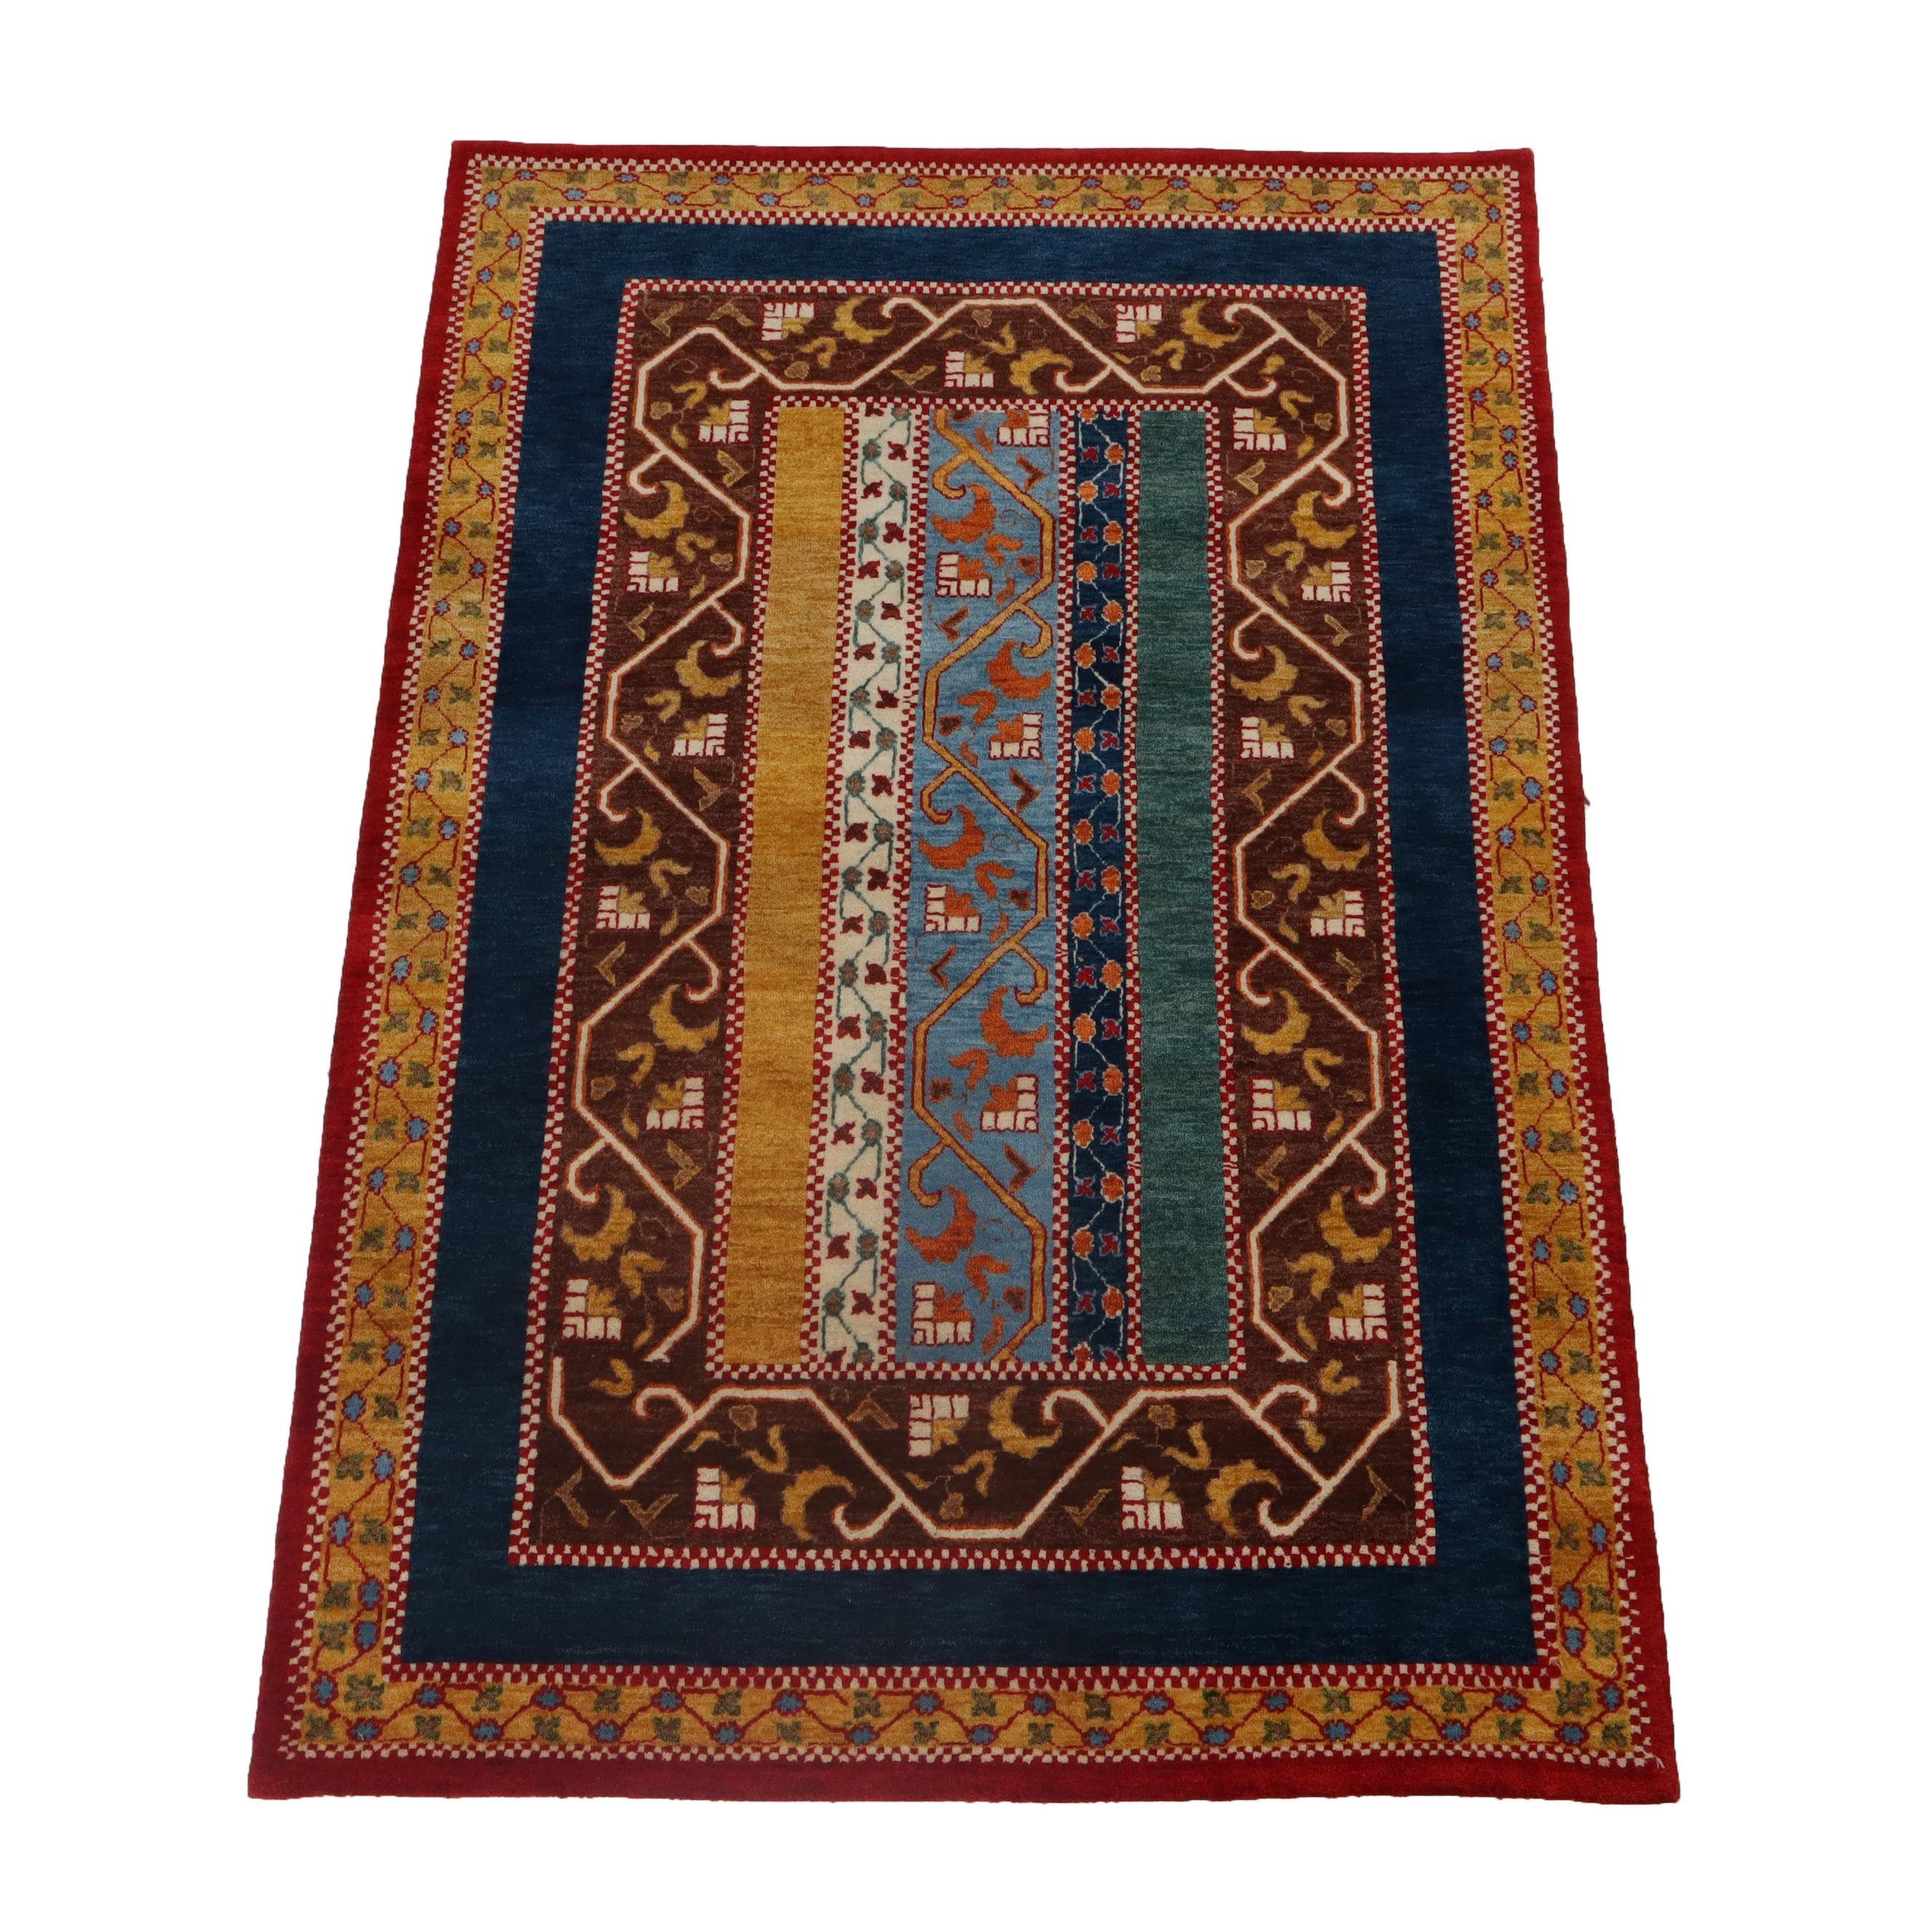 3'11 x 5'10 Hand-Knotted Pakistani Persian Tabriz Wool Rug